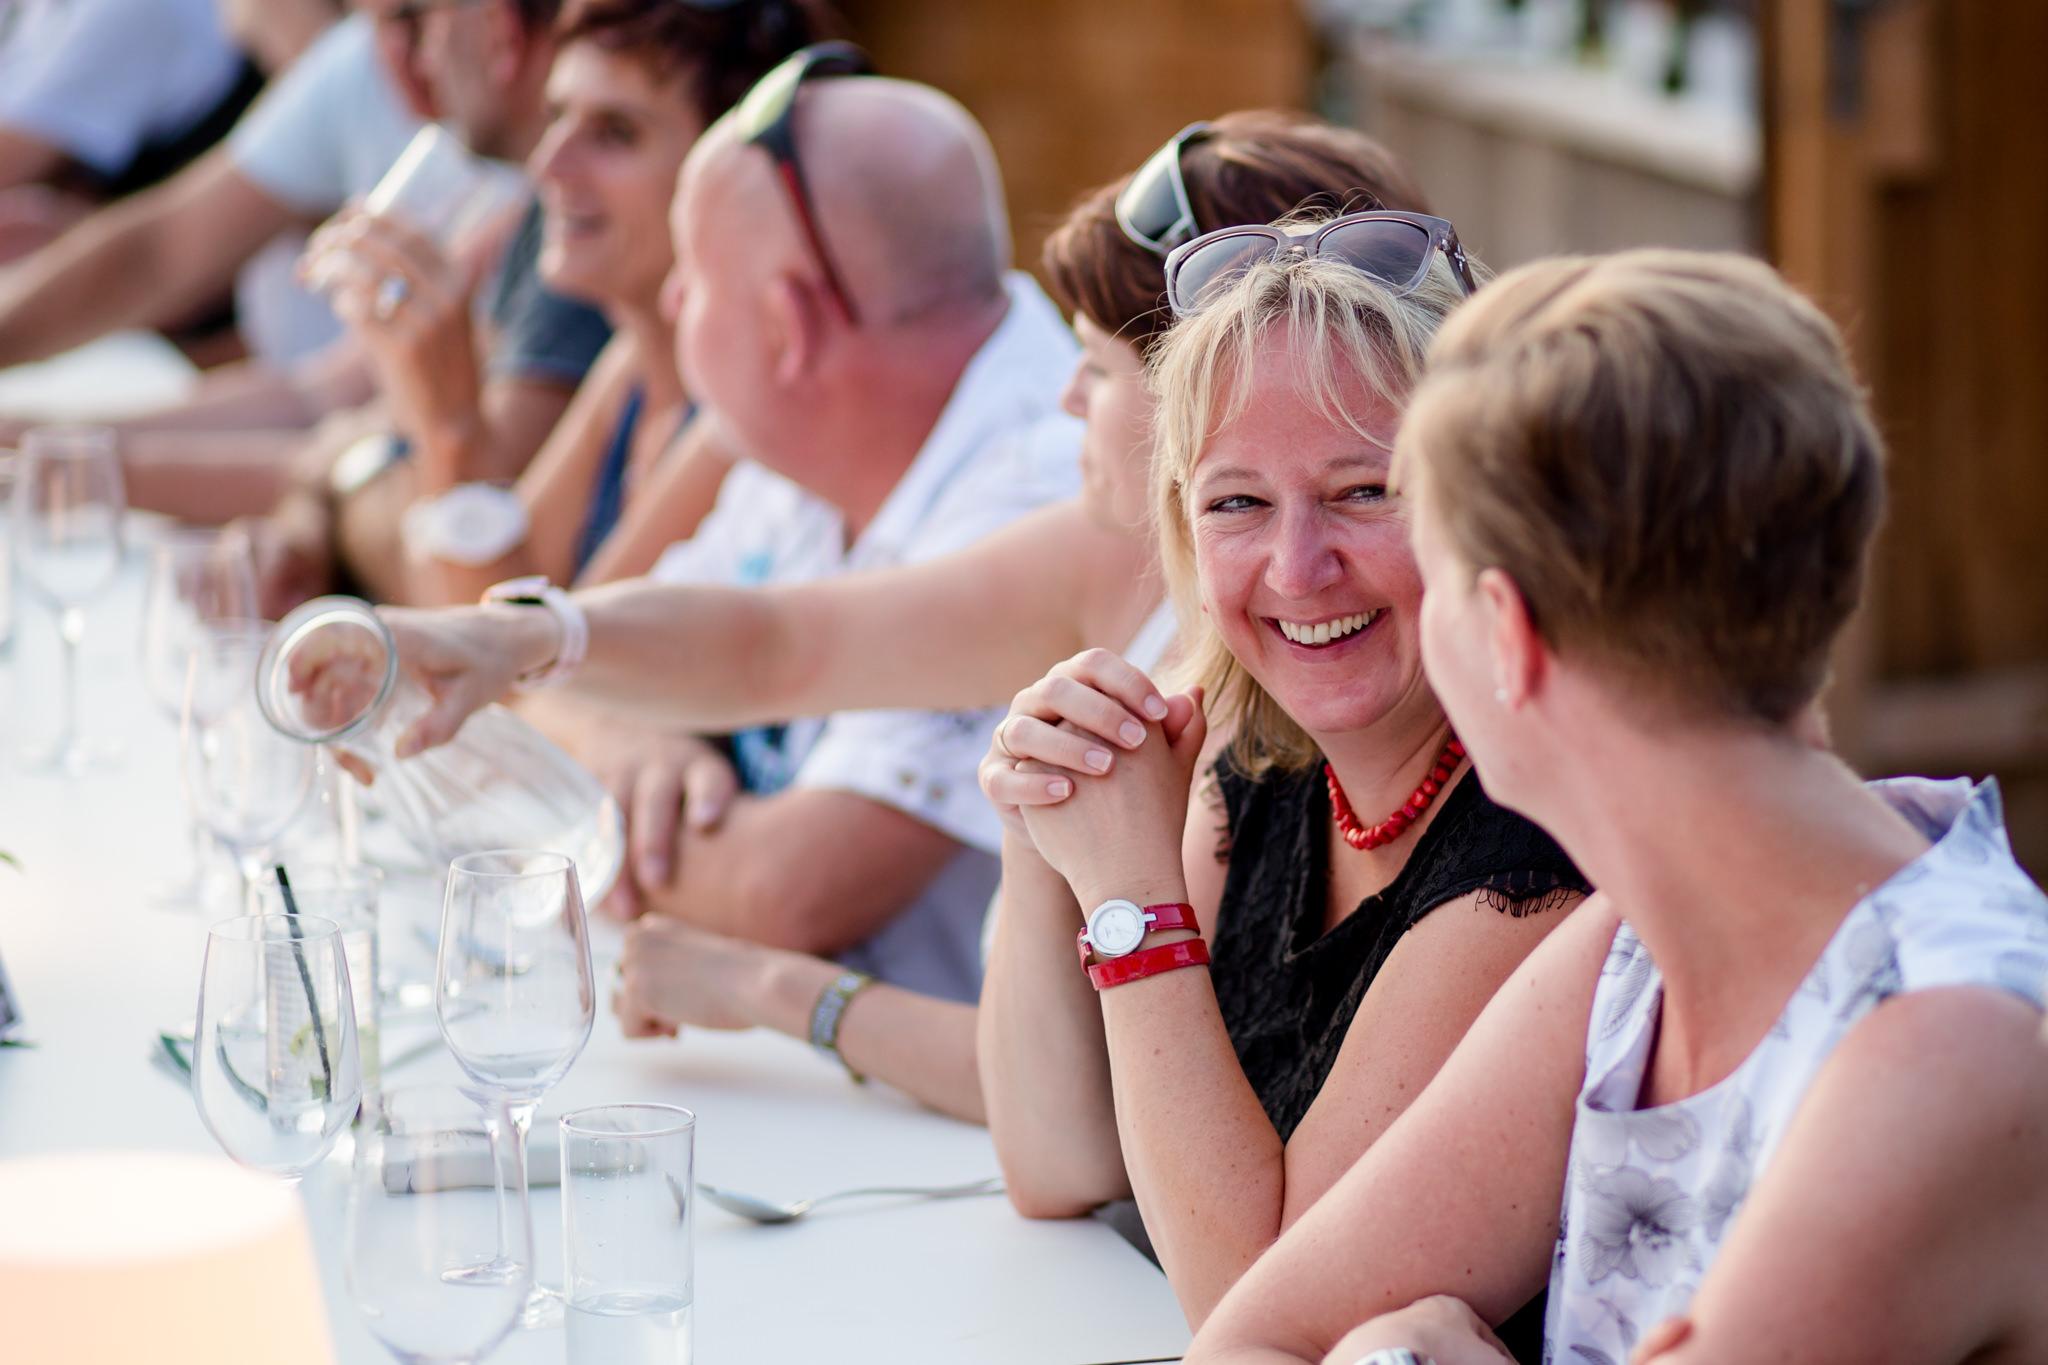 051-Wine-and-Dine-Wolfgangsee-Kirchenwirt-2019-Stefanie-Reindl-Photography-Web